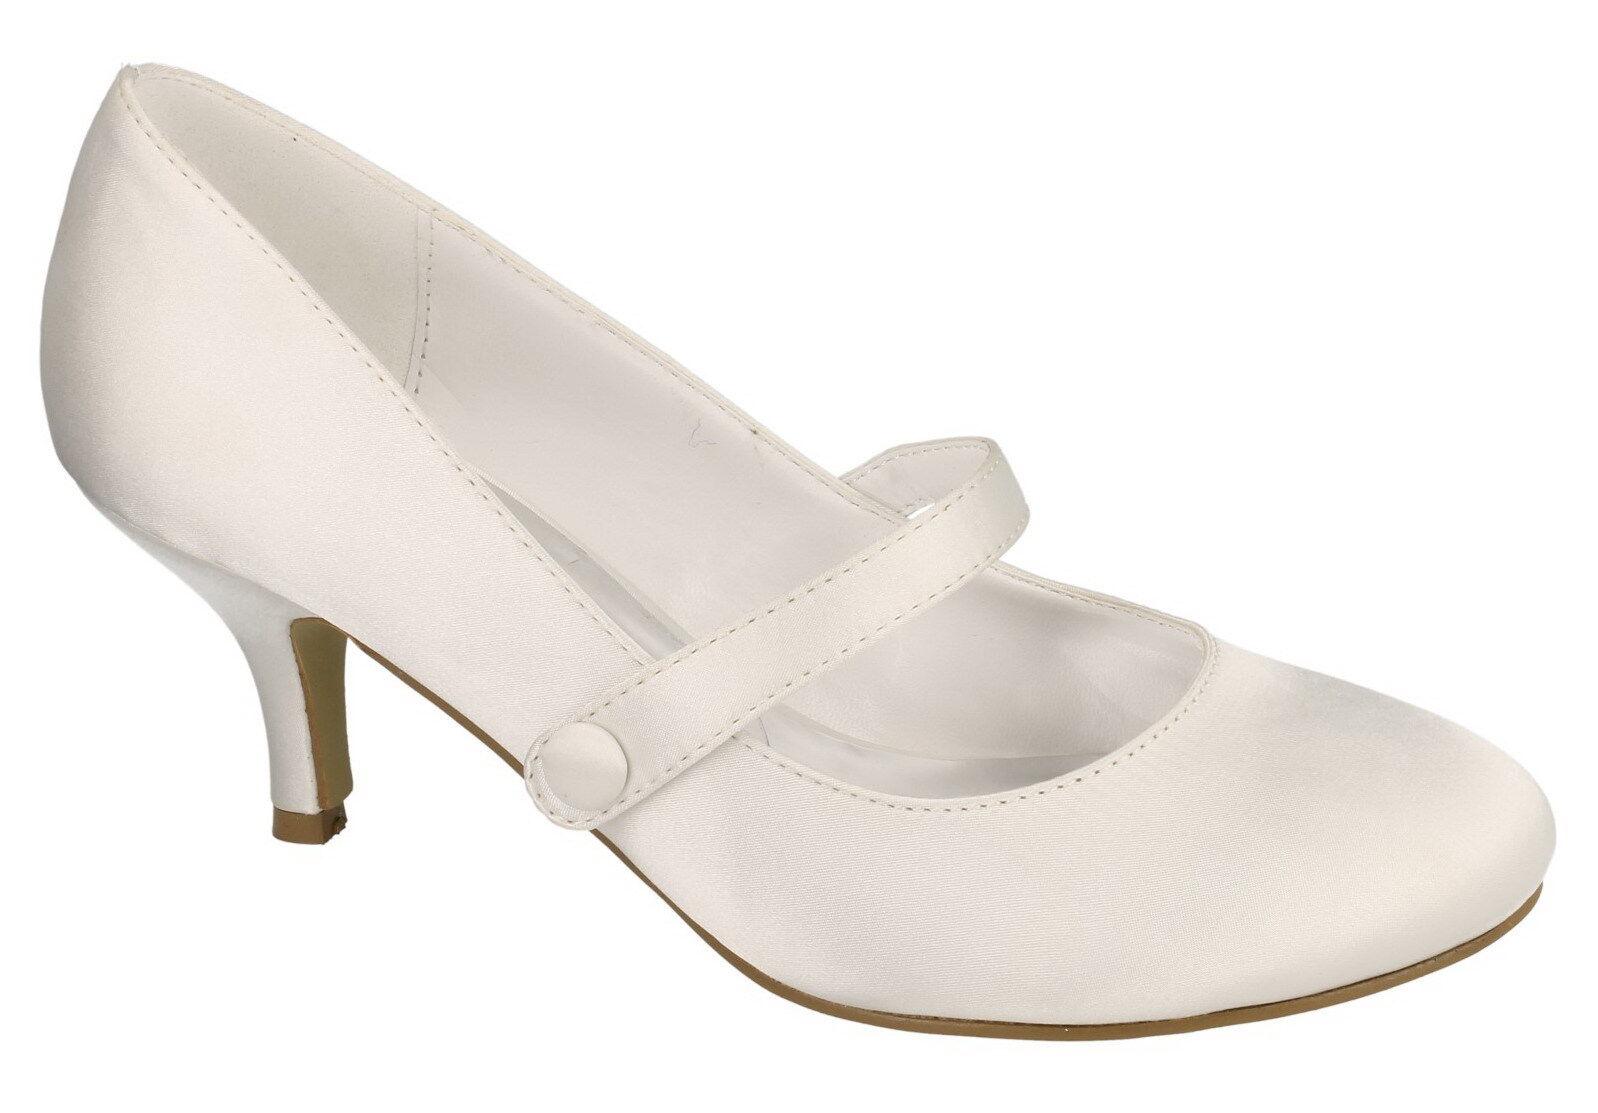 LADIES ANNE MICHELLE WHITE SATIN WEDDING SHOES F9753